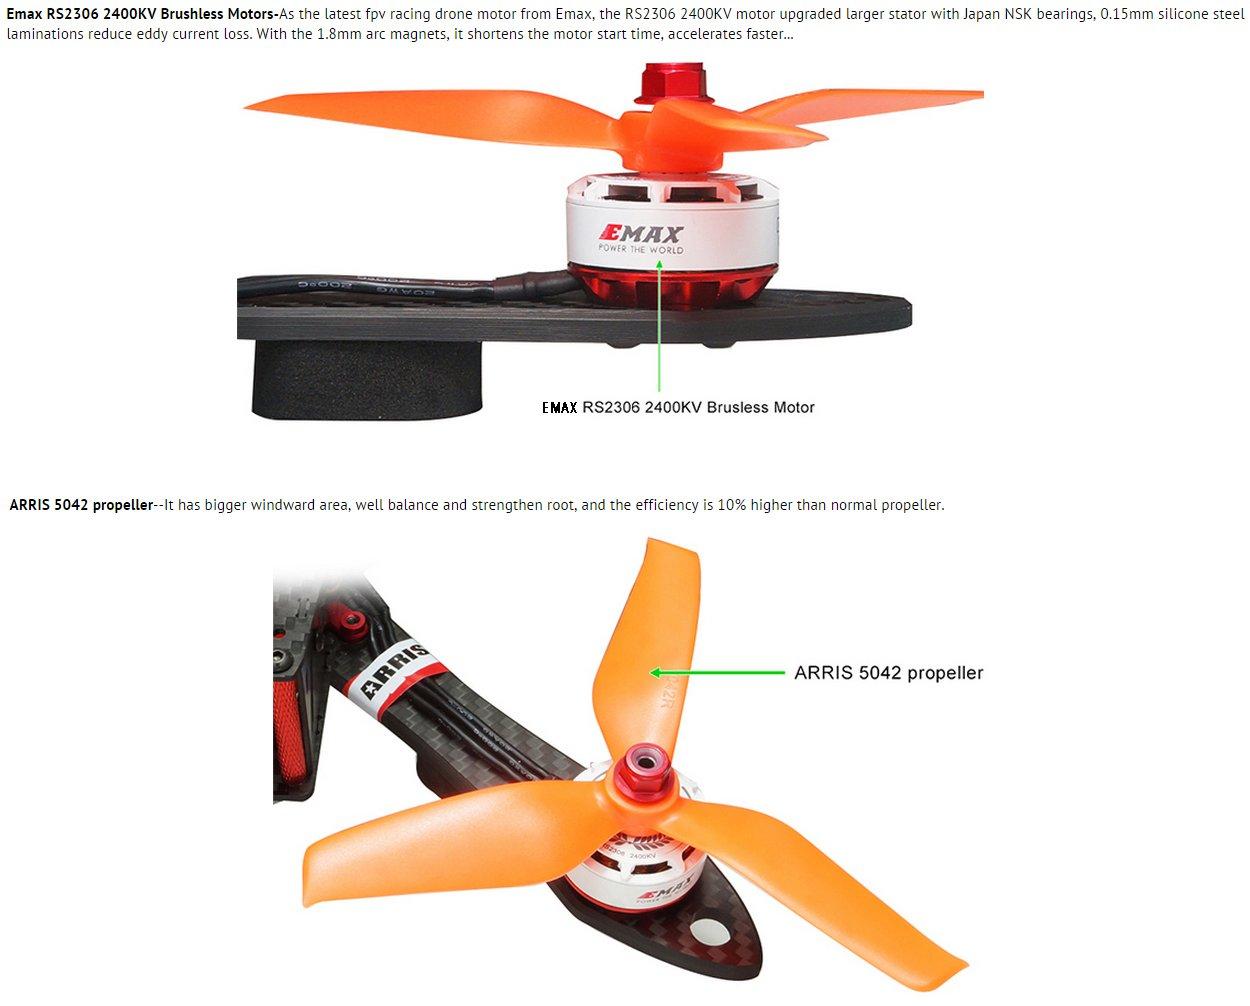 Runcam Swift 2 FPV Camera Professional Version ARRIS X220 220mm V2 Racing Drone FPV RC Quadcopter ARF w//EMAX RS2306 Motor